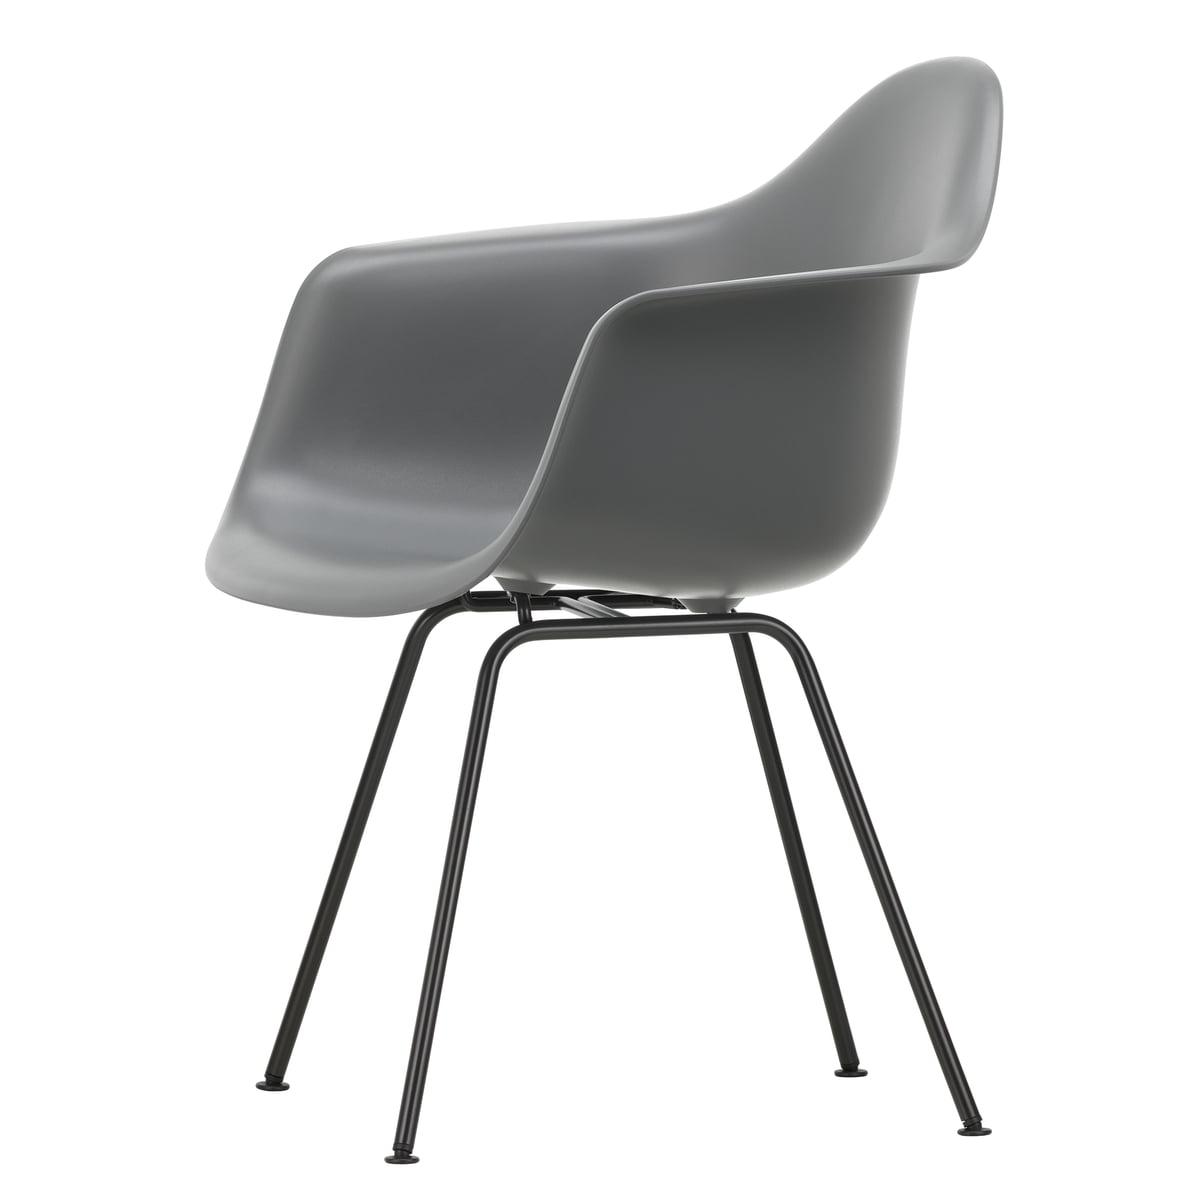 098f03ca4df45 Vitra-Eames-Plastic-Armchair-DAX-basic-dark-granitgrau.jpg